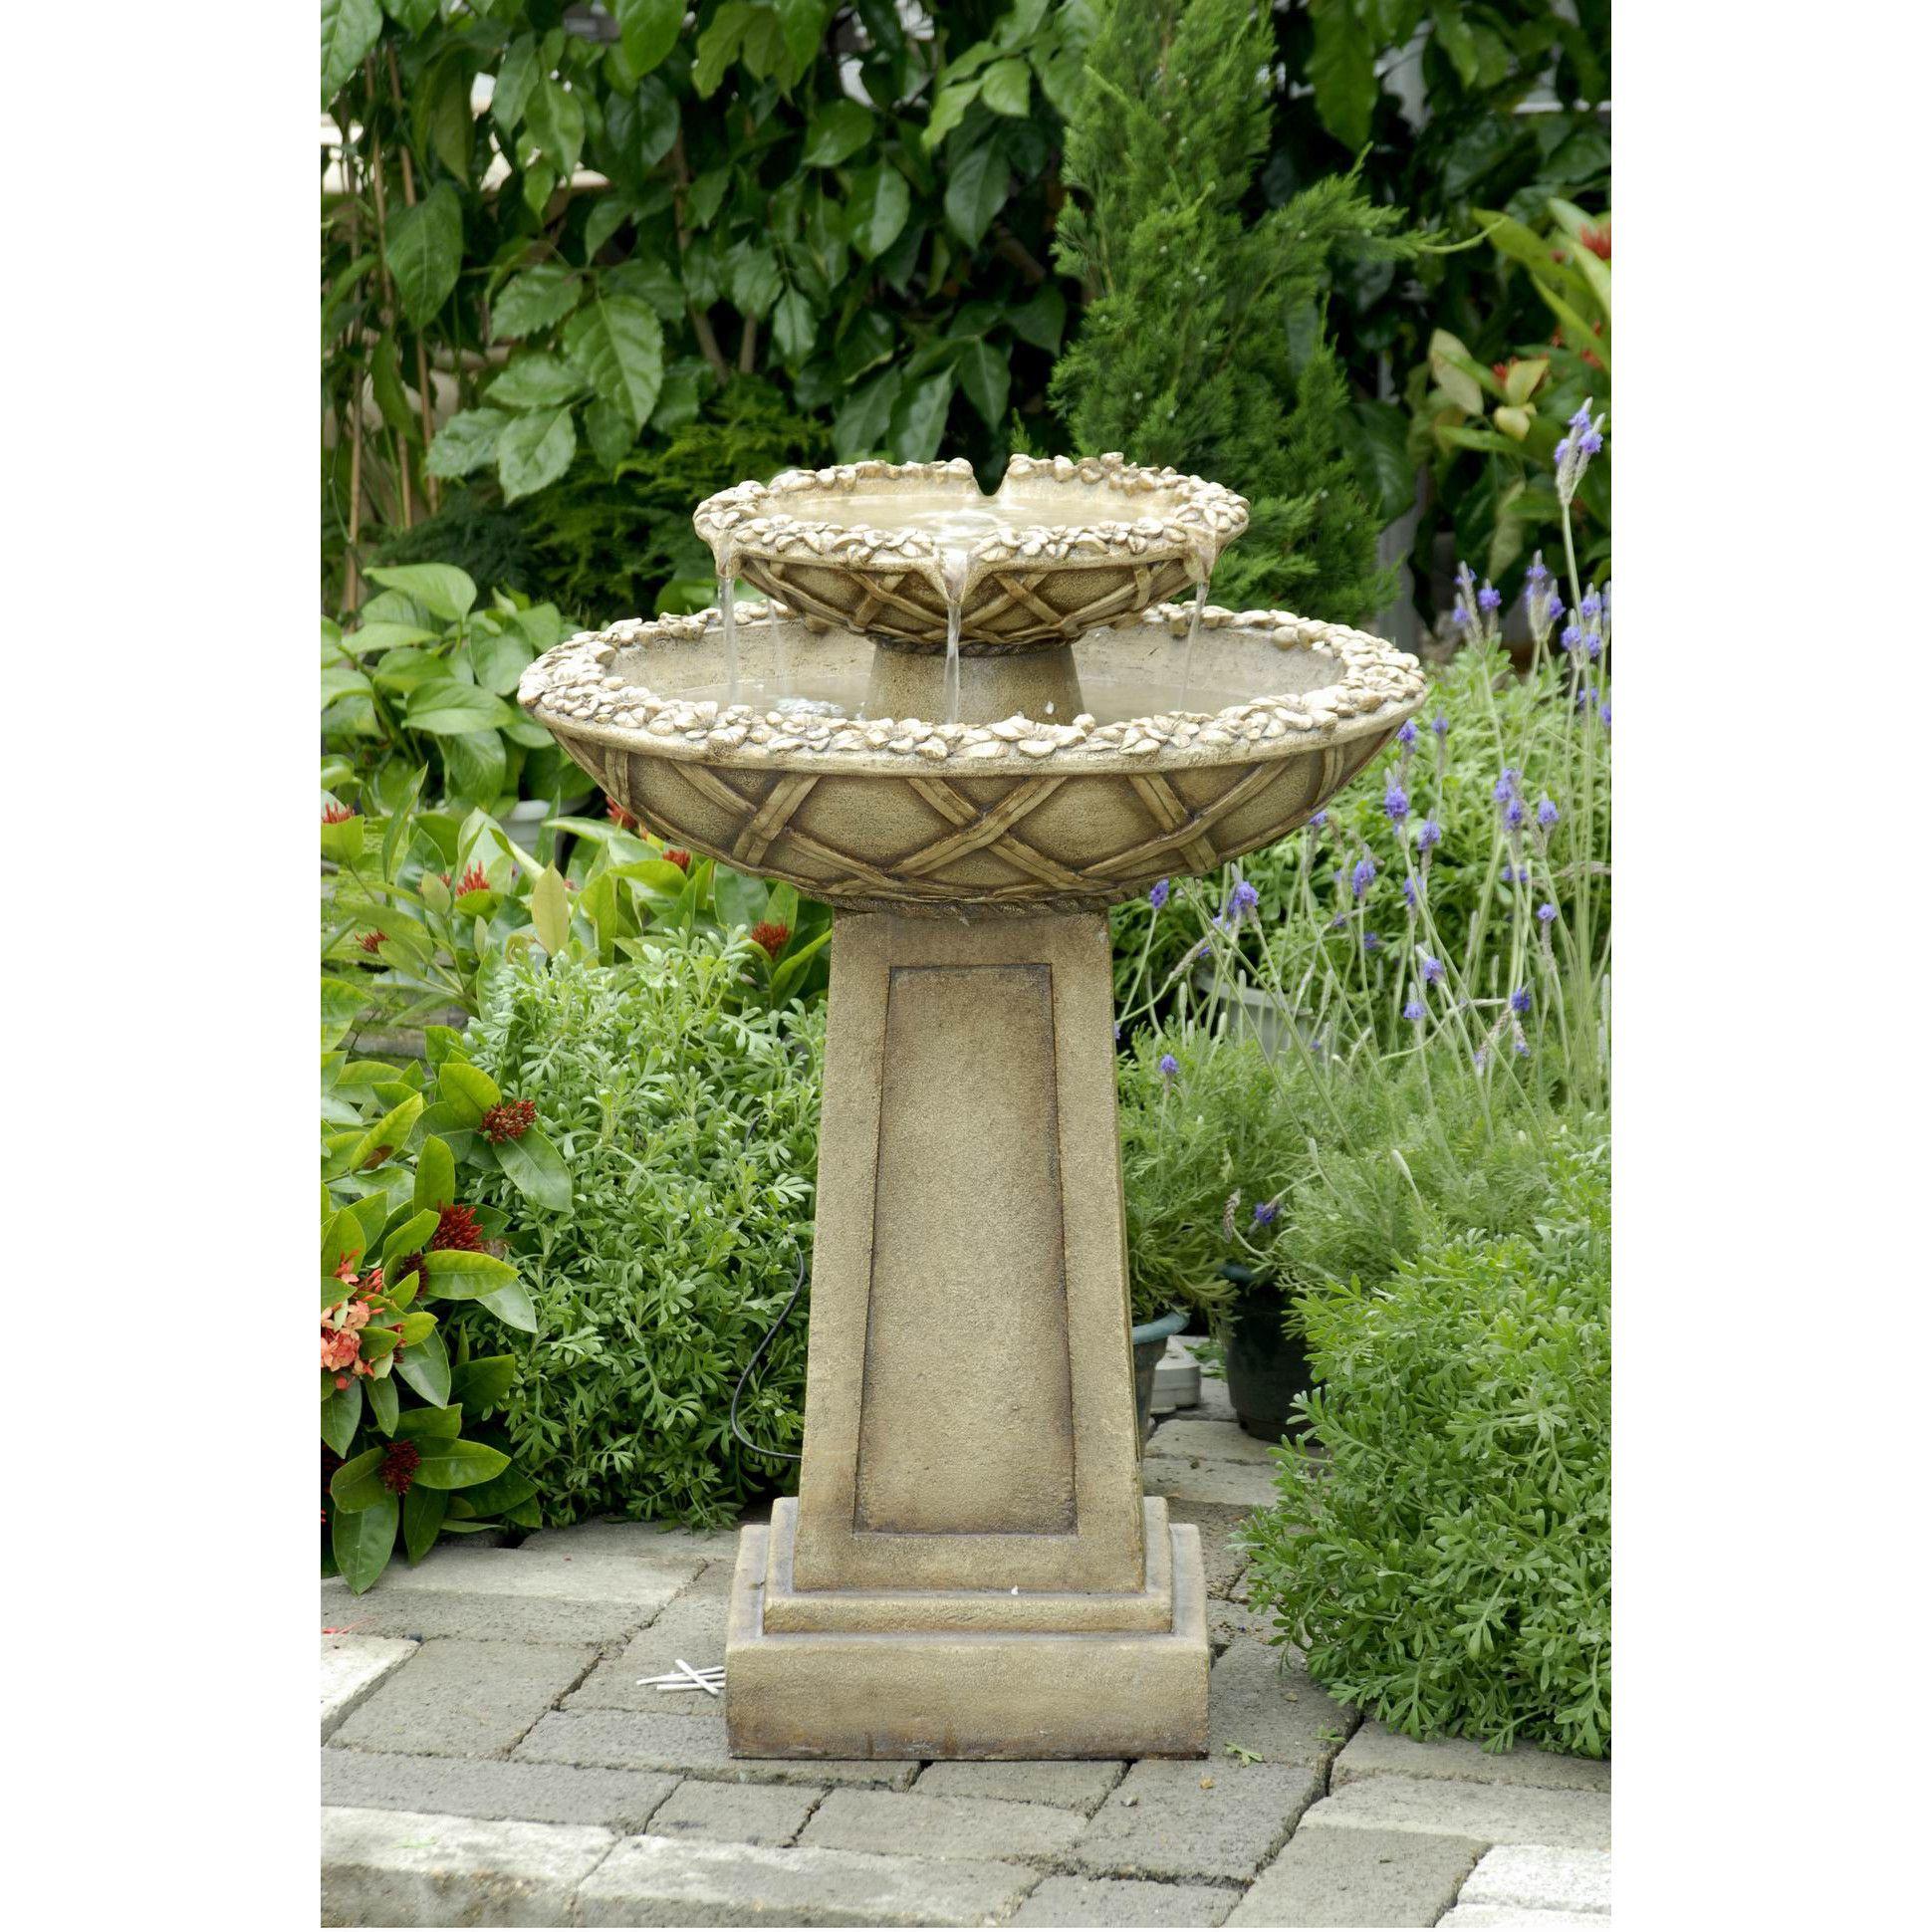 Polyresin U0026 Fiberglass Tiered Bird Bath Fountain